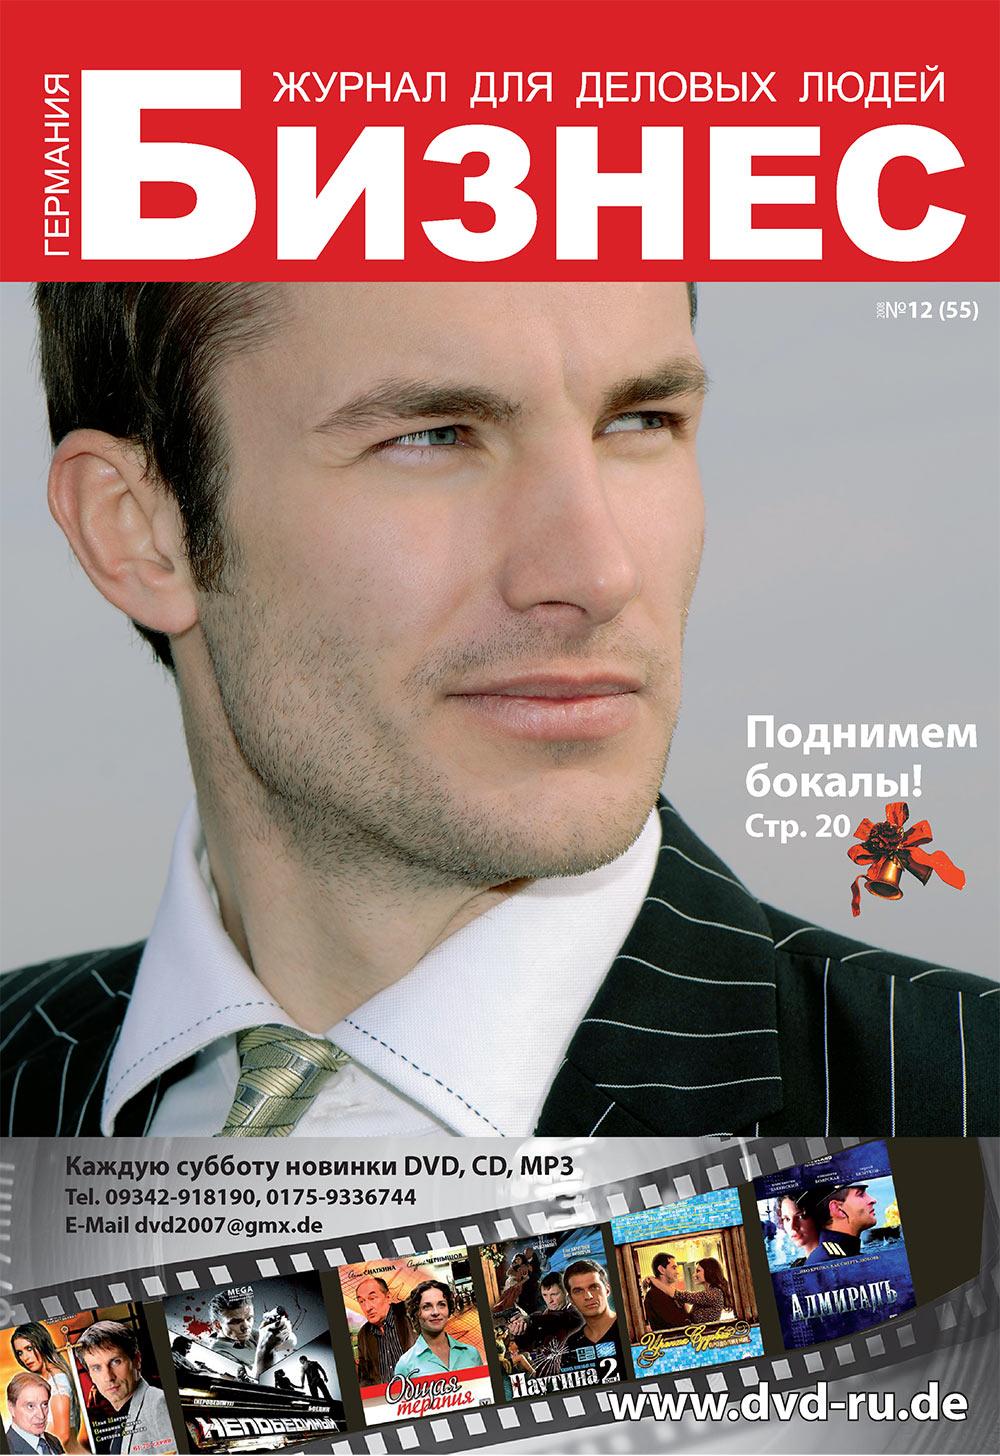 Бизнес (журнал). 2008 год, номер 12, стр. 1